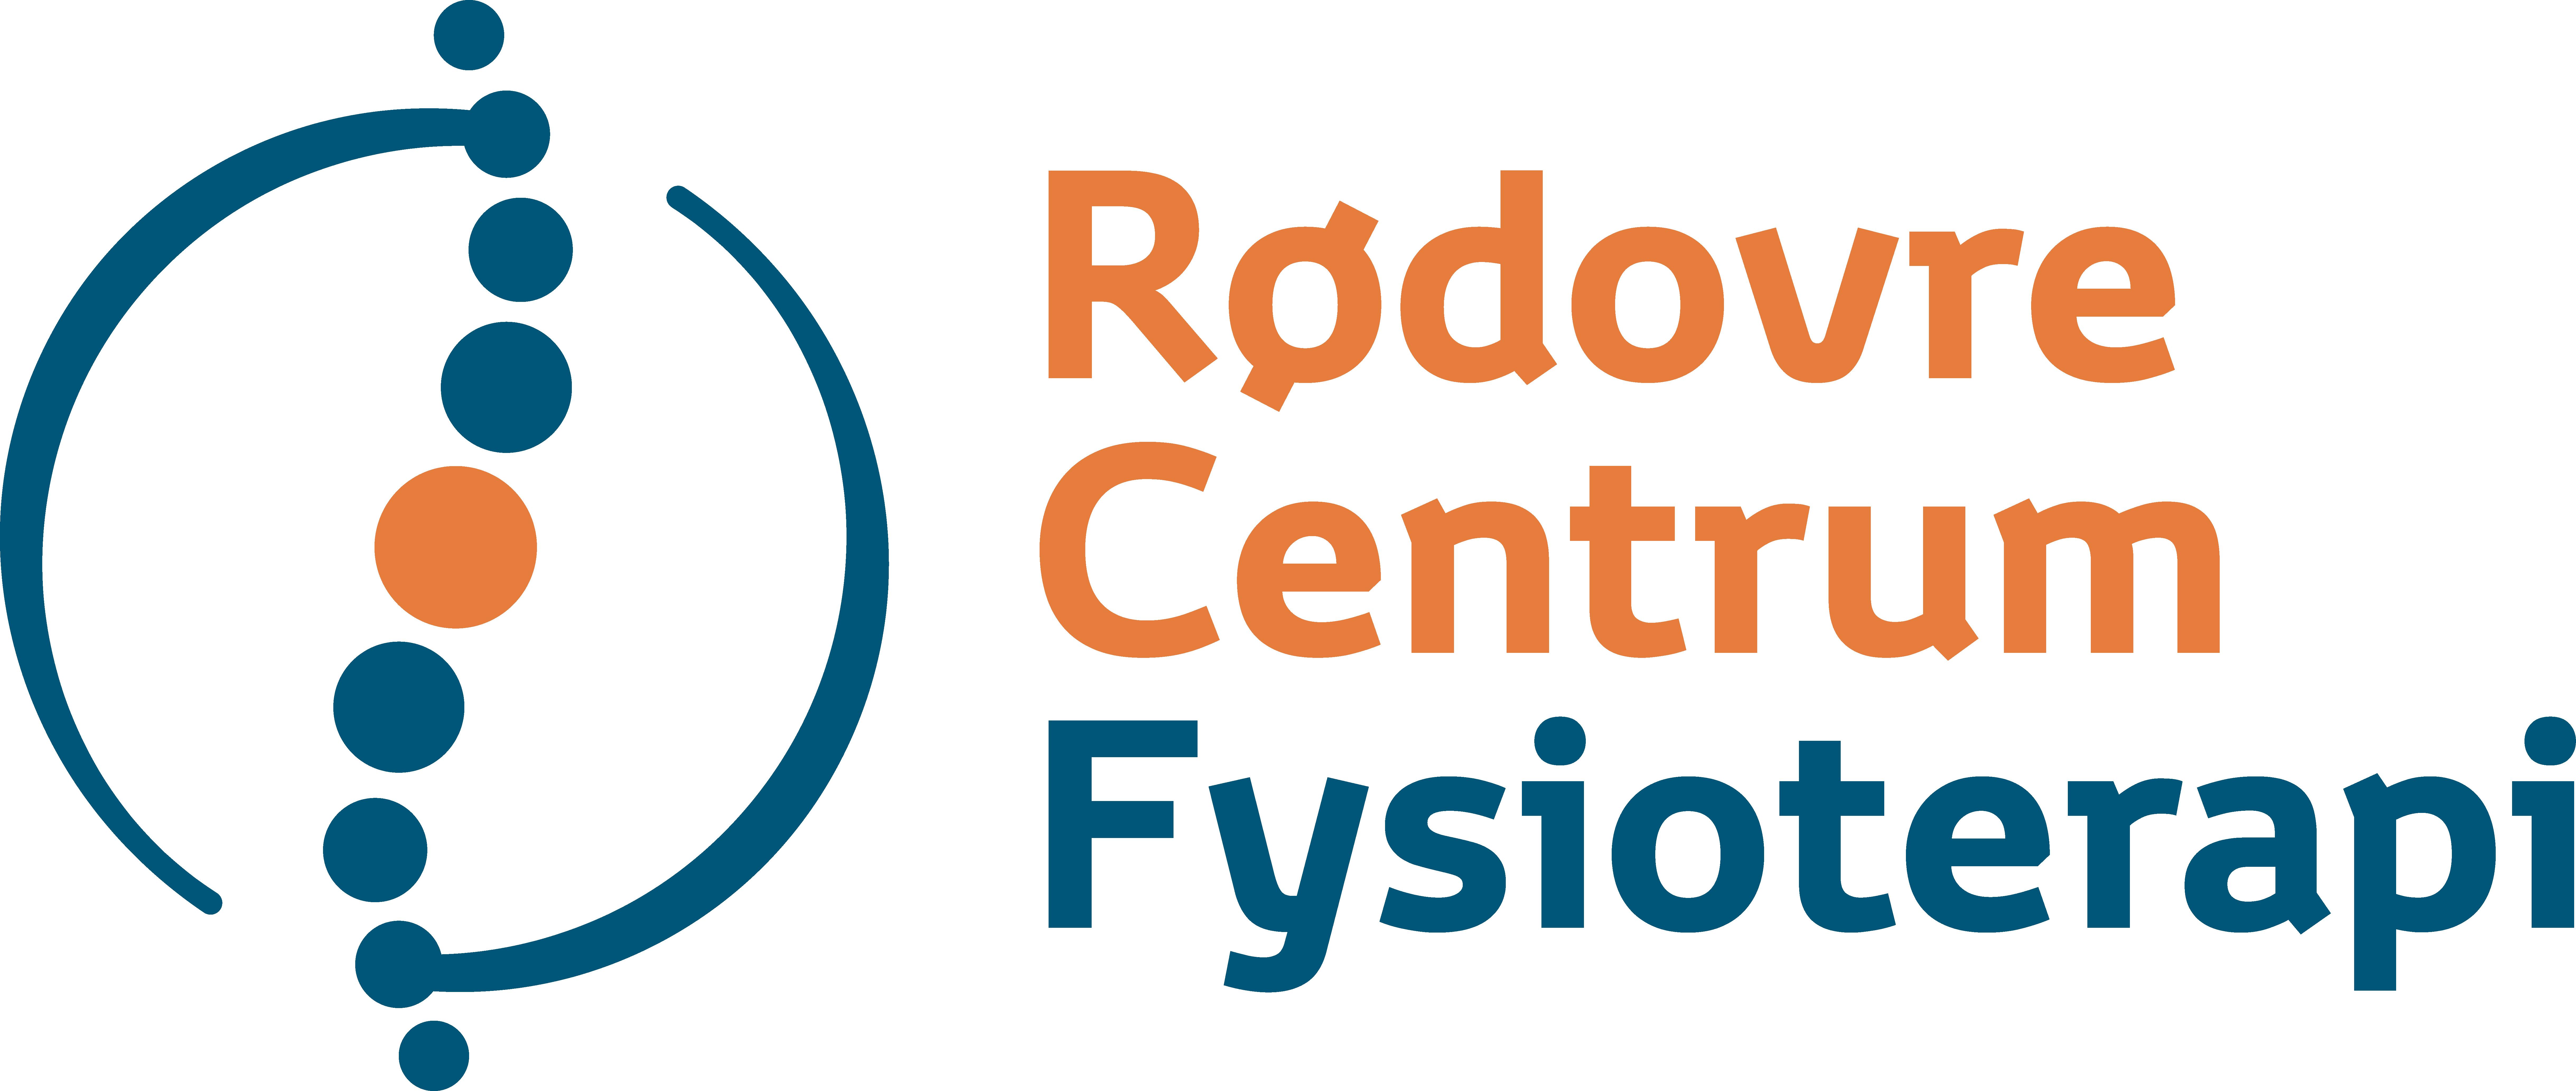 Rødovre Centrum Fysioterapi